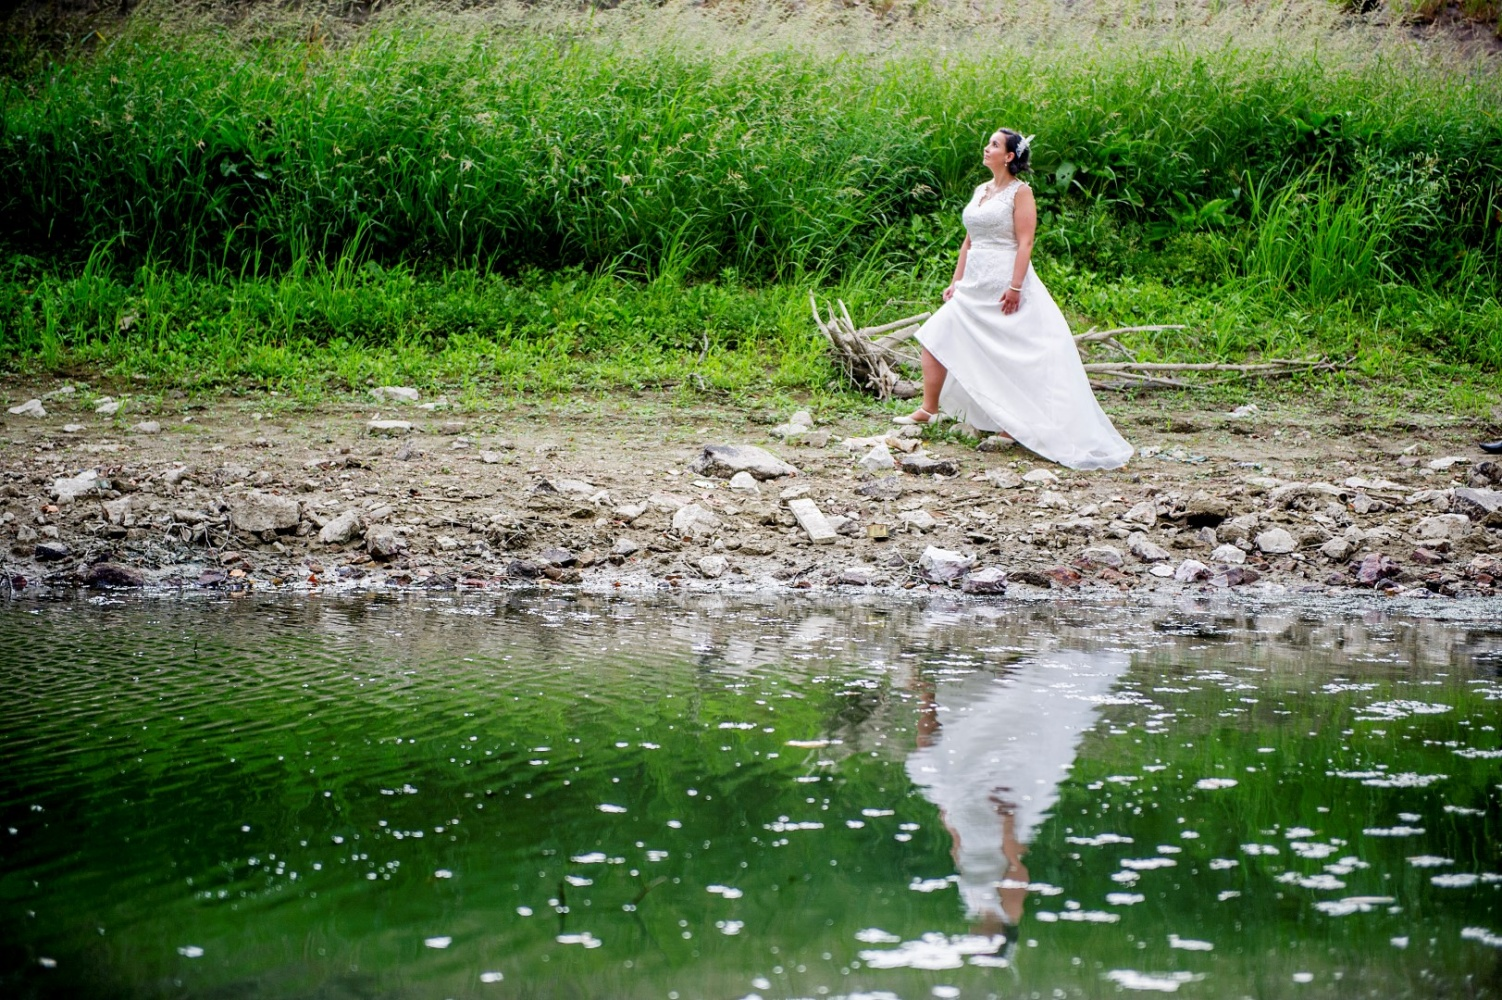 http://www.fotoz.sk/images/gallery-40/normal/svadobne-fotenie_hladam-fotografa_fotograf-nitra_fotost-keresek__svadobny-fotograf_eskuvoi-fotos_juraj-zsok_064.jpg